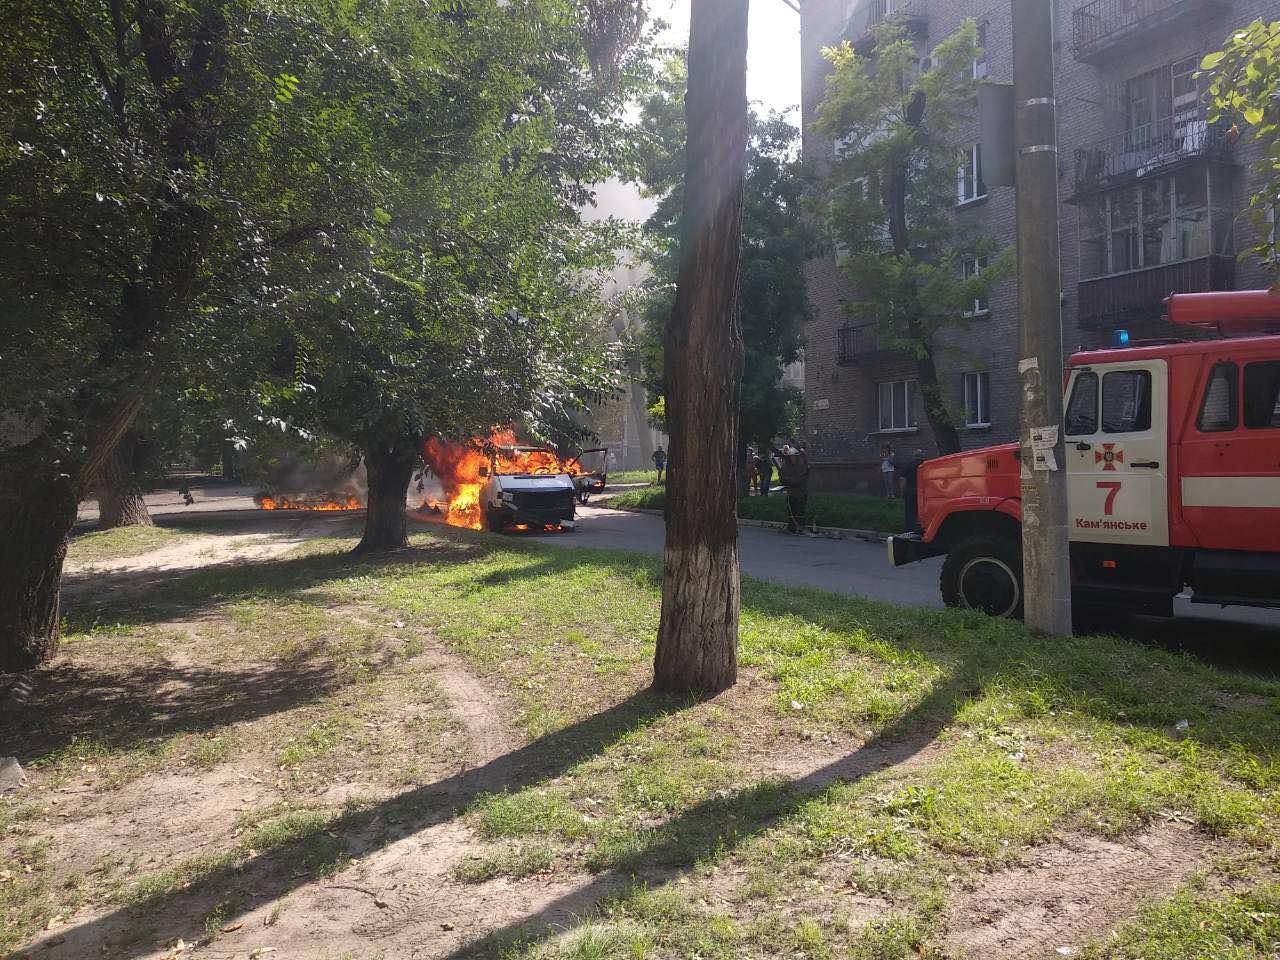 В Днепропетровской области взорвали машину: внутри находился депутат горсовета, - ФОТО, фото-3